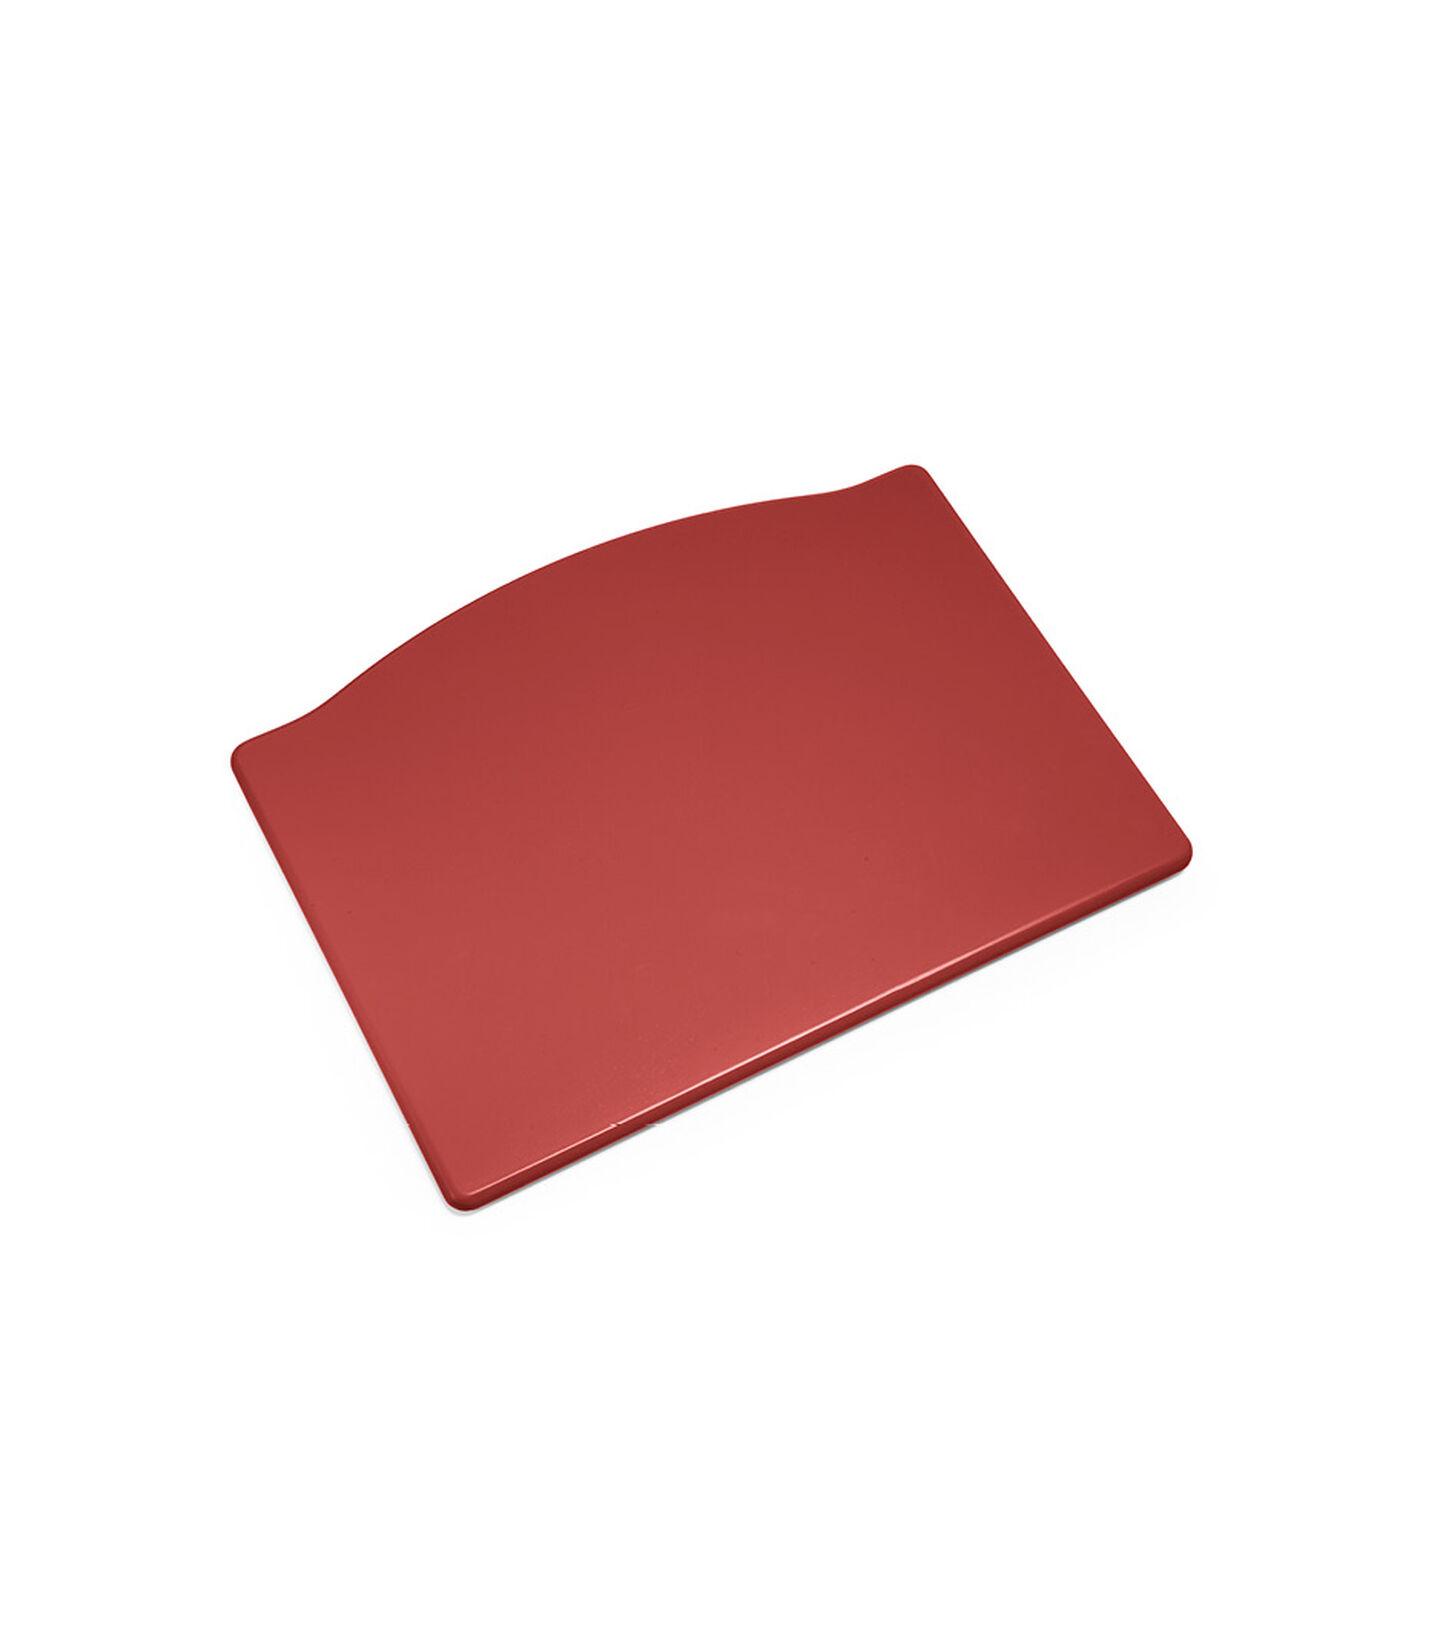 Tripp Trapp® Voetenplank Warm rood, Warm rood, mainview view 1